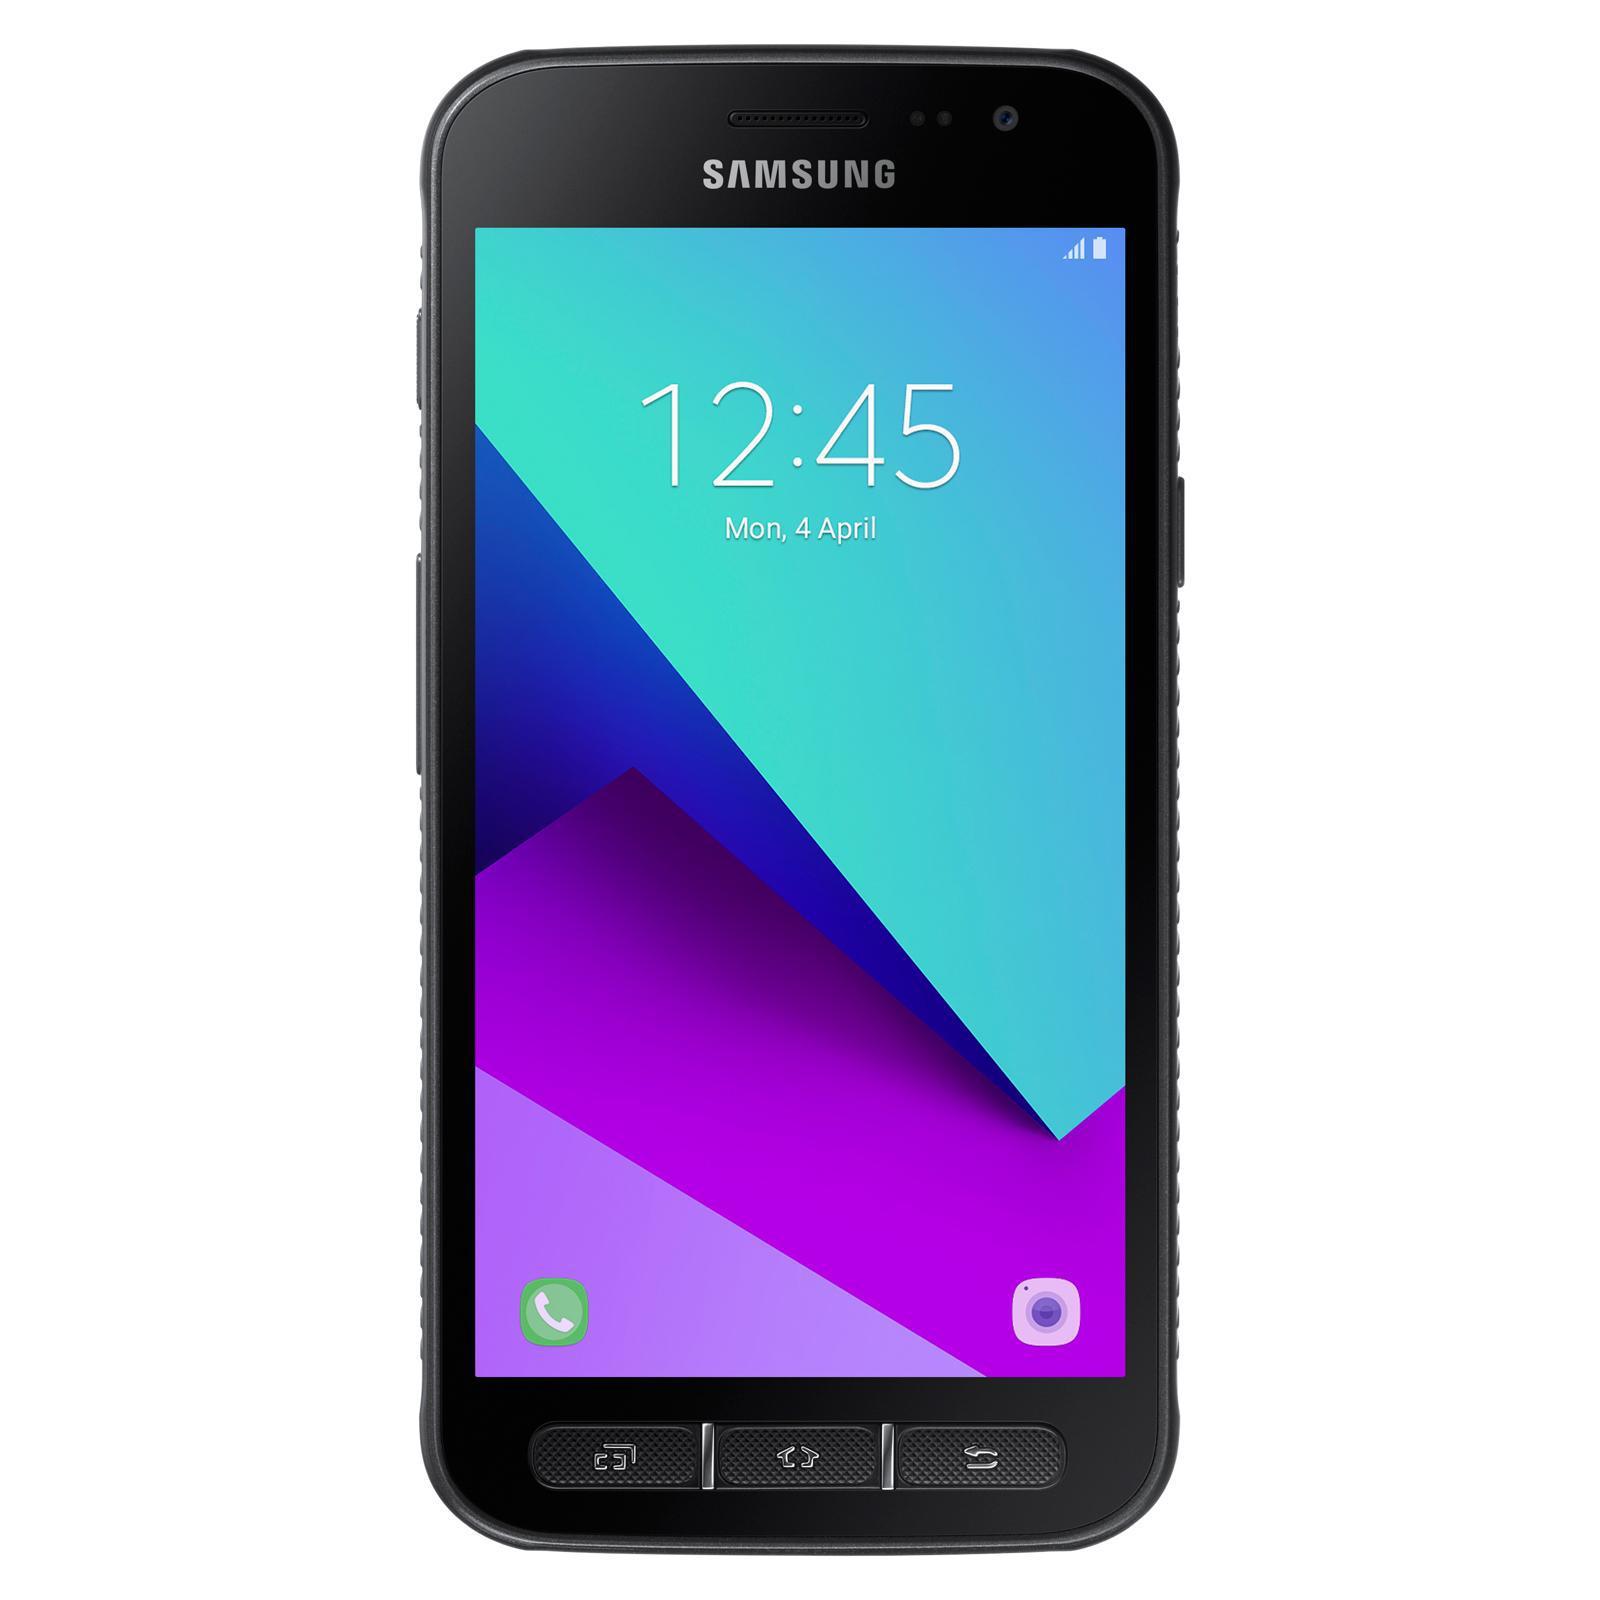 Galaxy Xcover 4 - 16 GB - Noir - Neuf - Garantie 2 ans - Emballage abimé